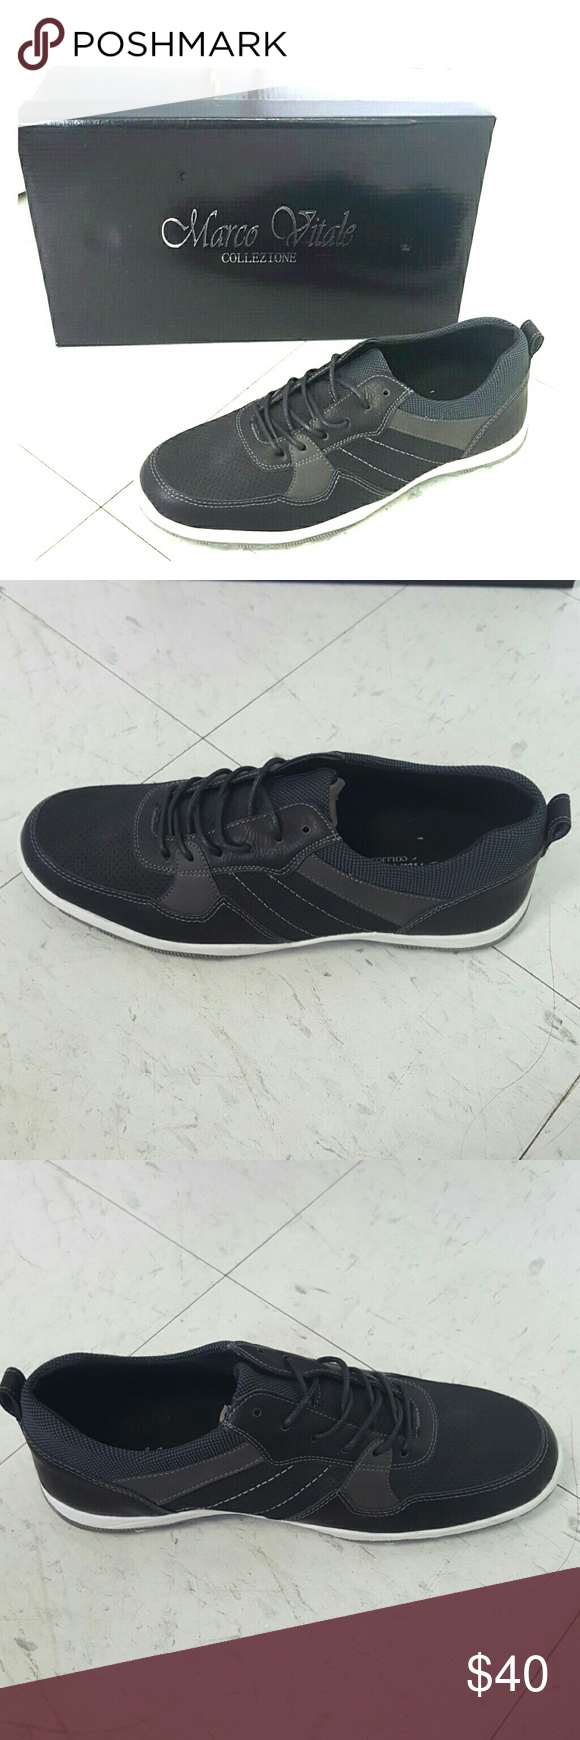 Mens black  casual sneaker size 8 Mens black  casual sneaker size 8 Marco Vitale Collezione  Shoes Sneakers